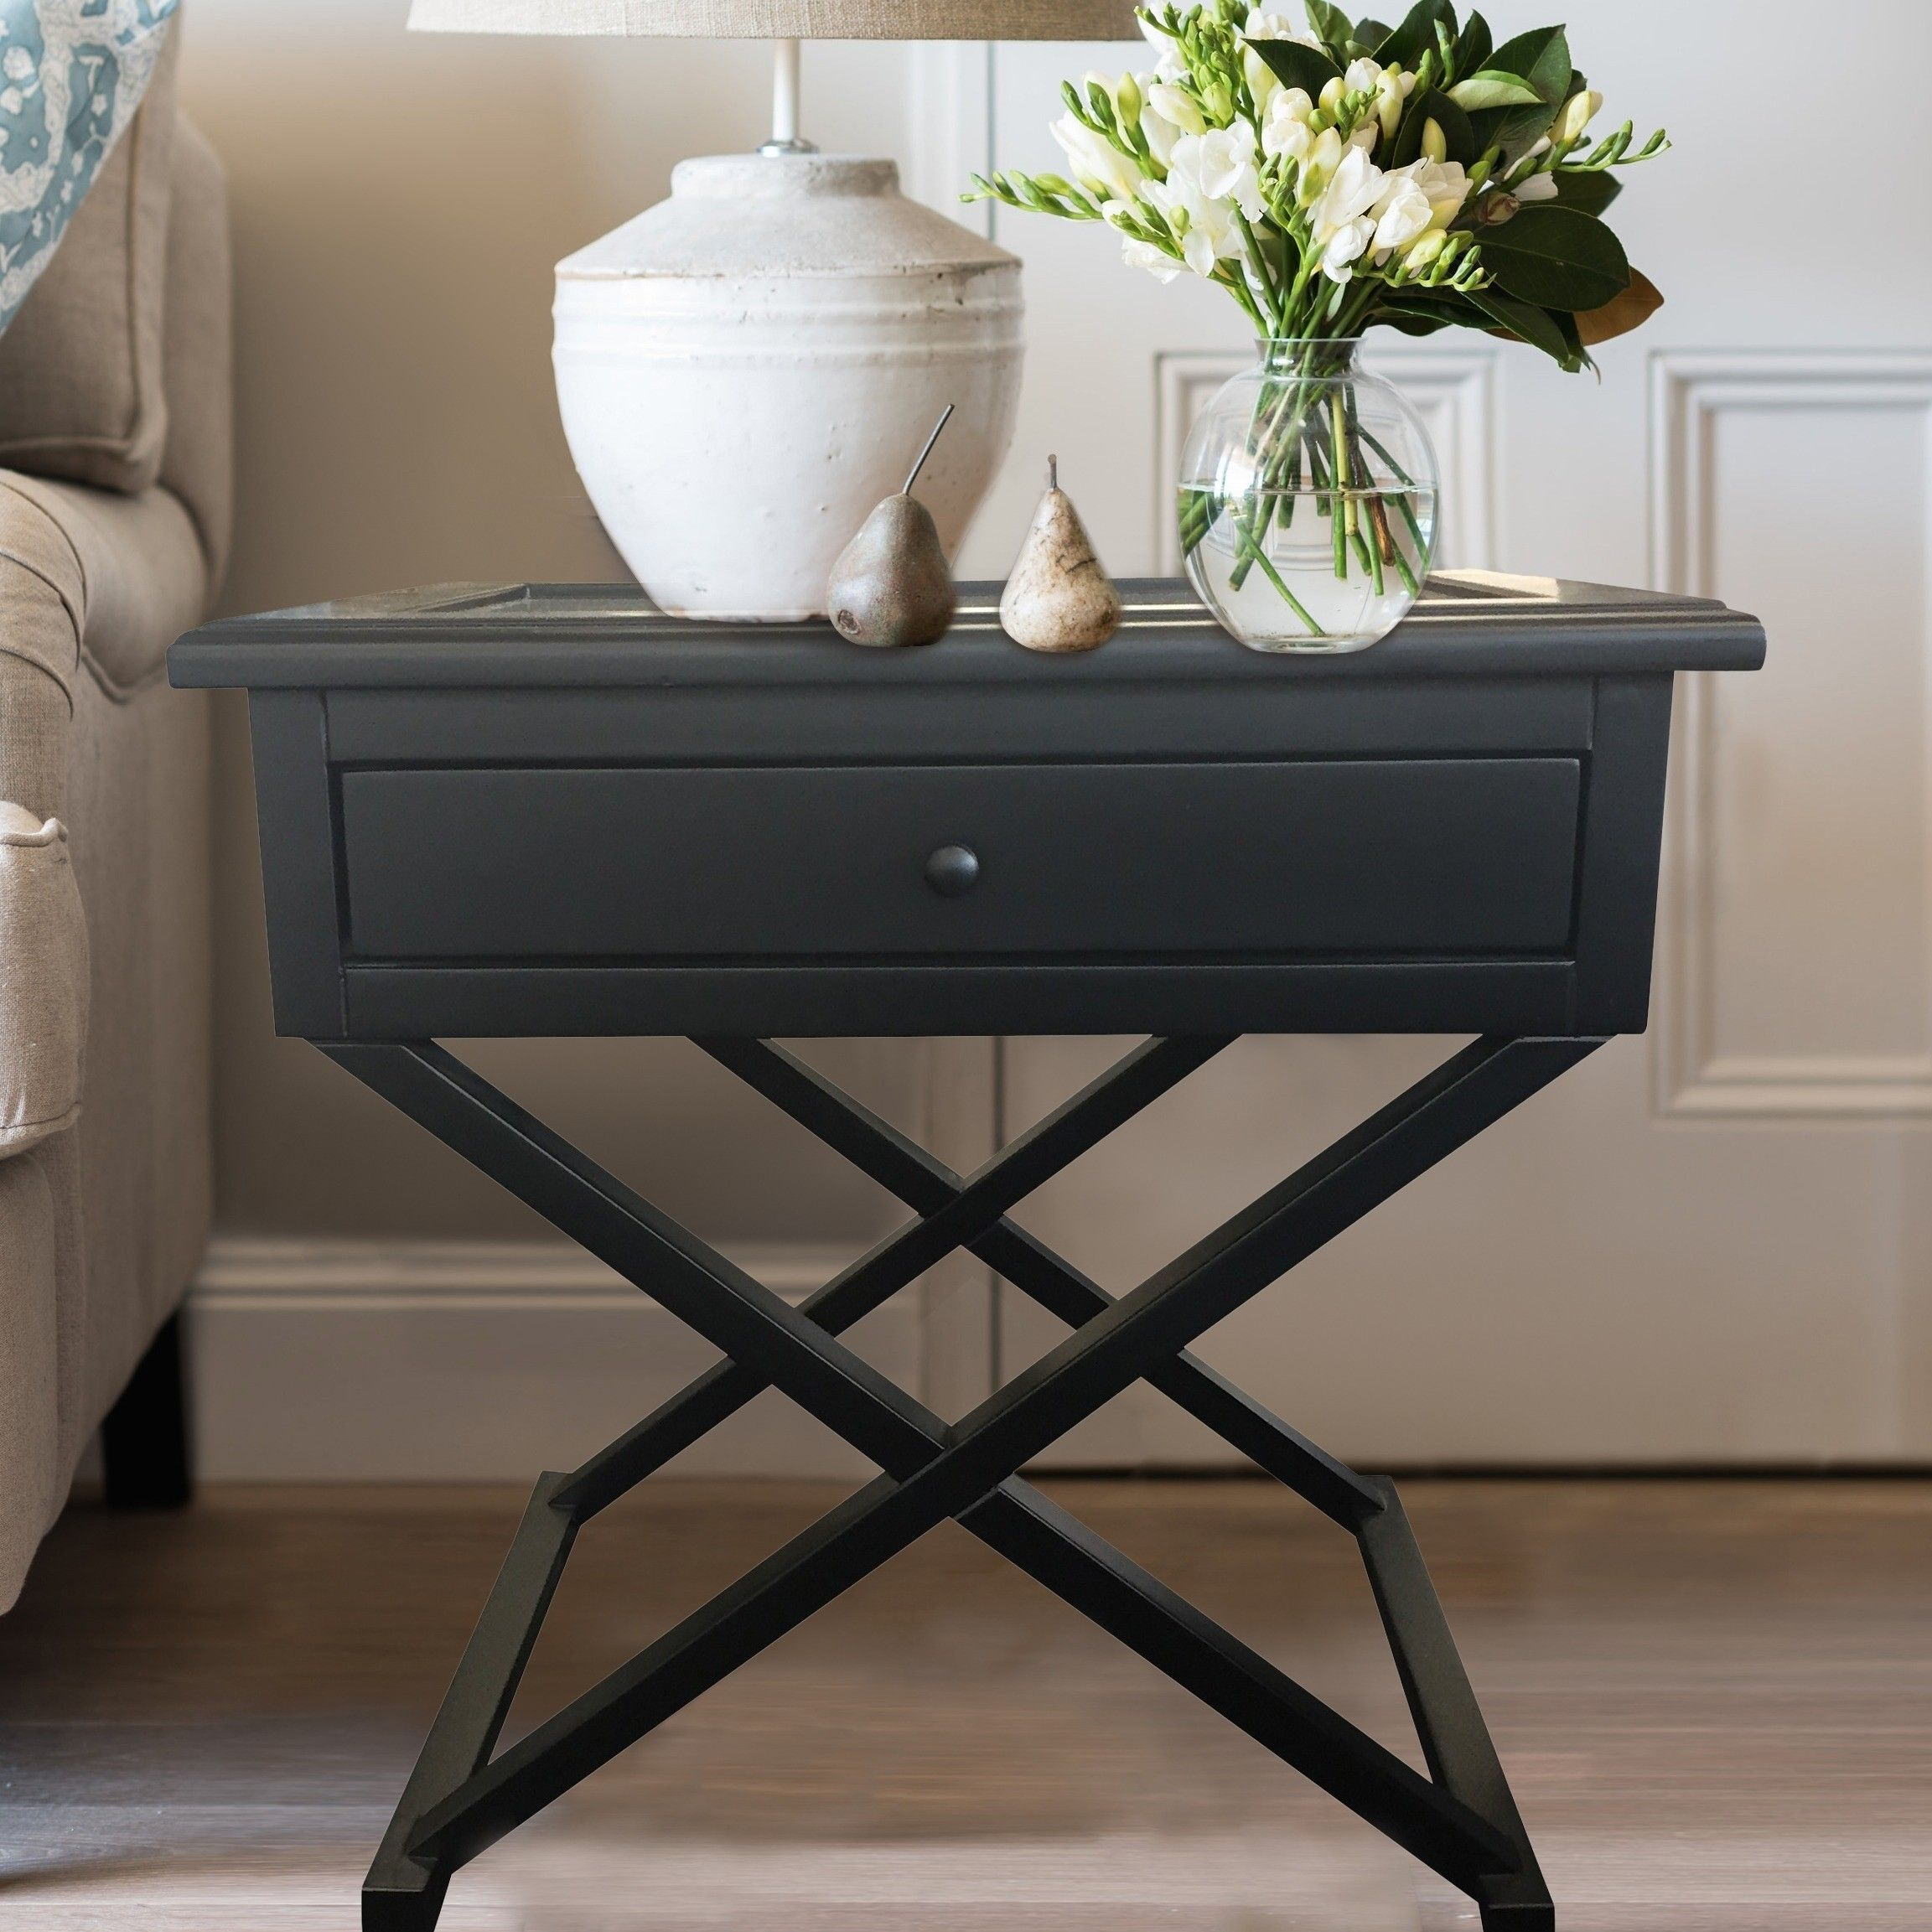 Black Cross Leg Side Table Small Bedside Table Black Side Table